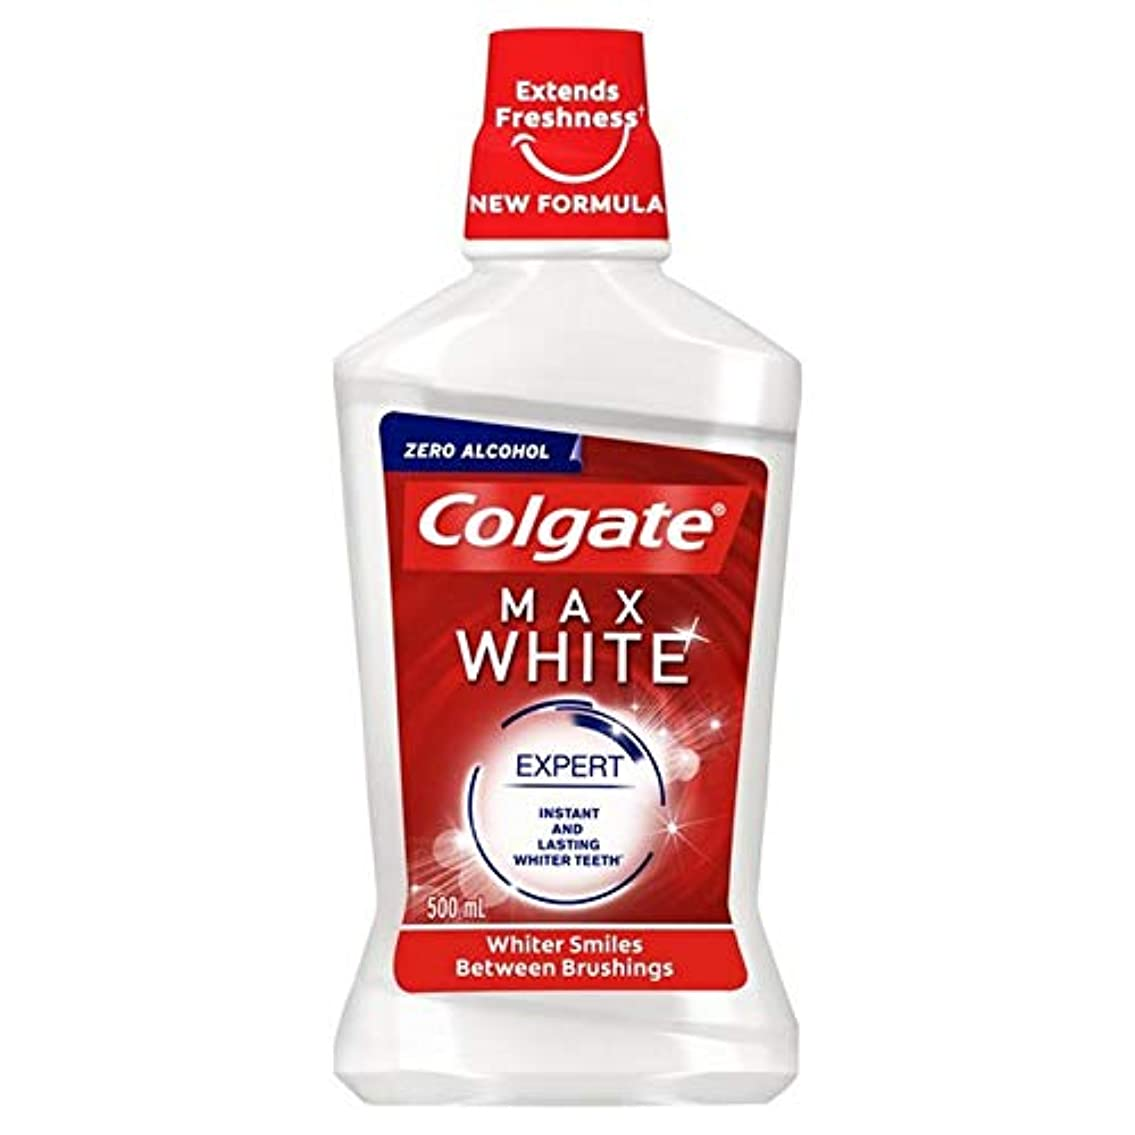 [Colgate ] コルゲートマックスホワイトホワイトニングマウスウォッシュ500ミリリットル - Colgate Max White Whitening Mouthwash 500ml [並行輸入品]